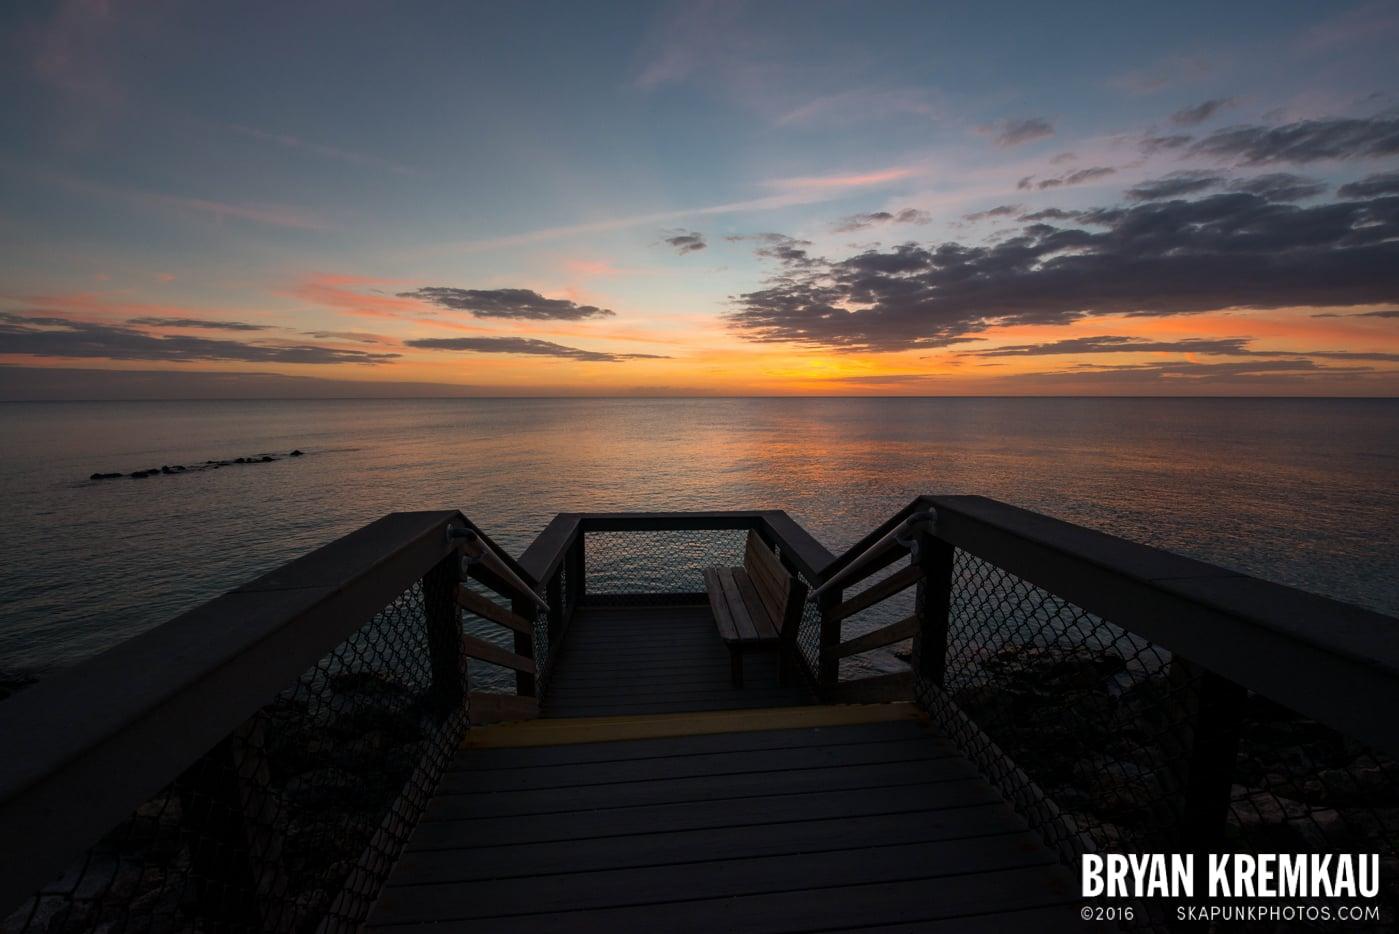 Sunsets, Astrophotography & Birds @ Venice, Florida - 10.25.14 - 11.5.14 (63)